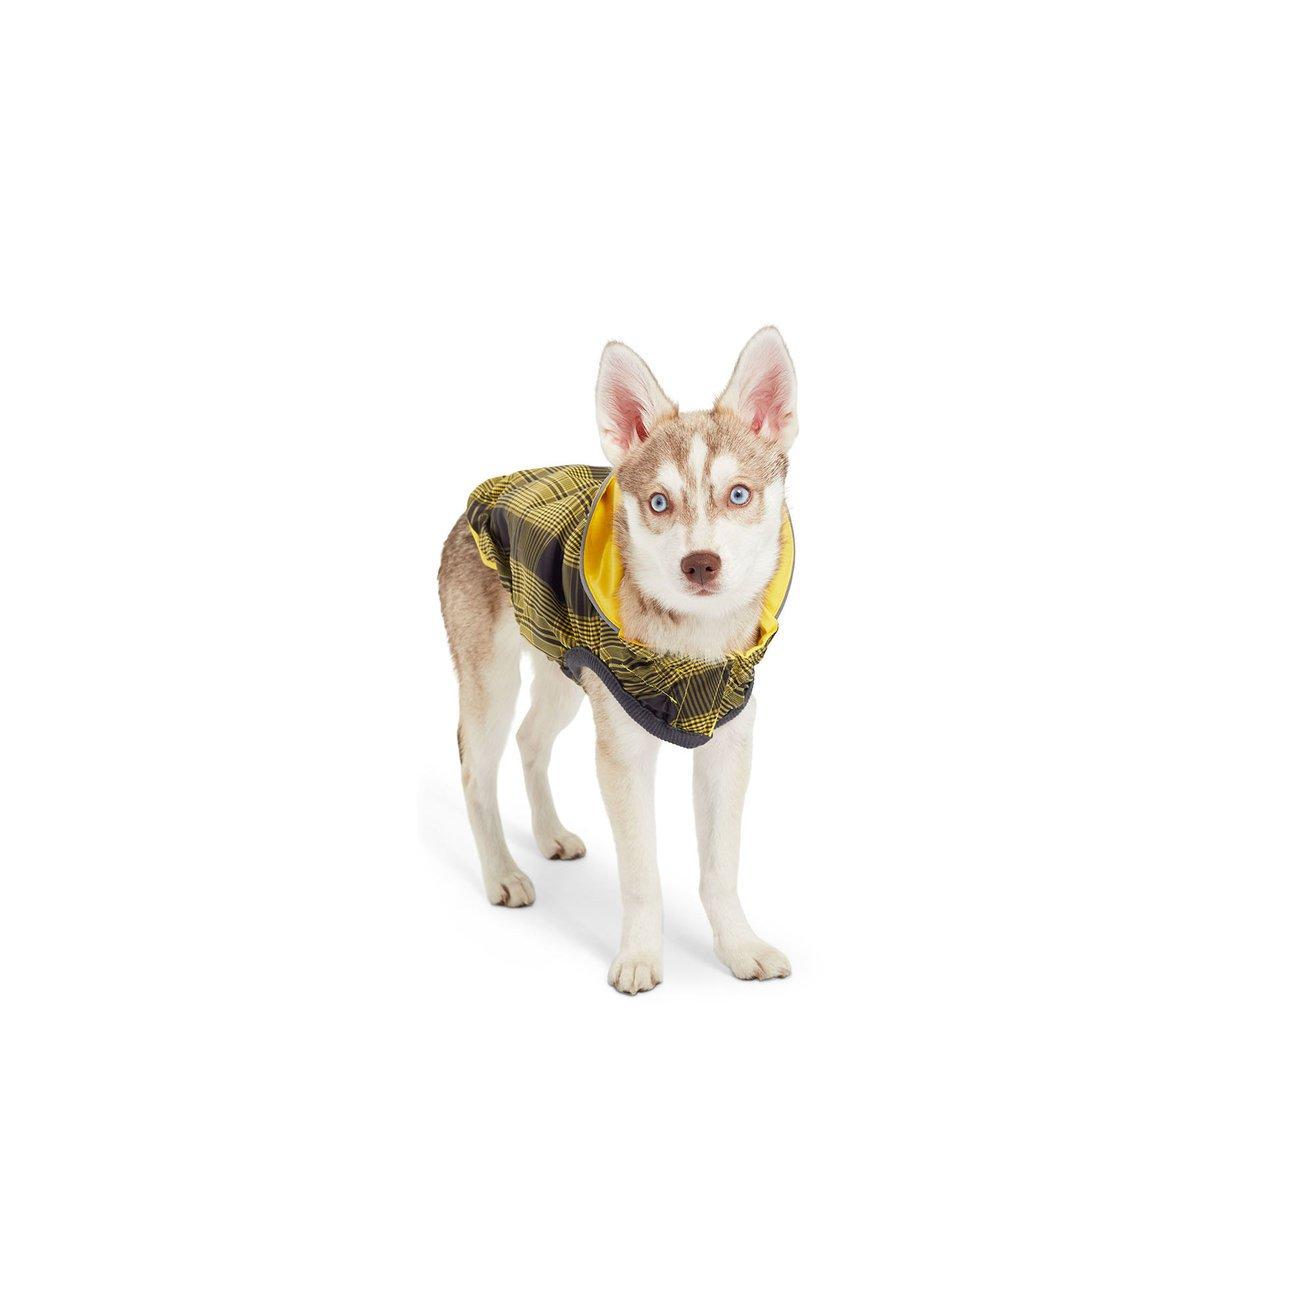 GF Pet wendbarer Hunderegenmantel, Bild 2